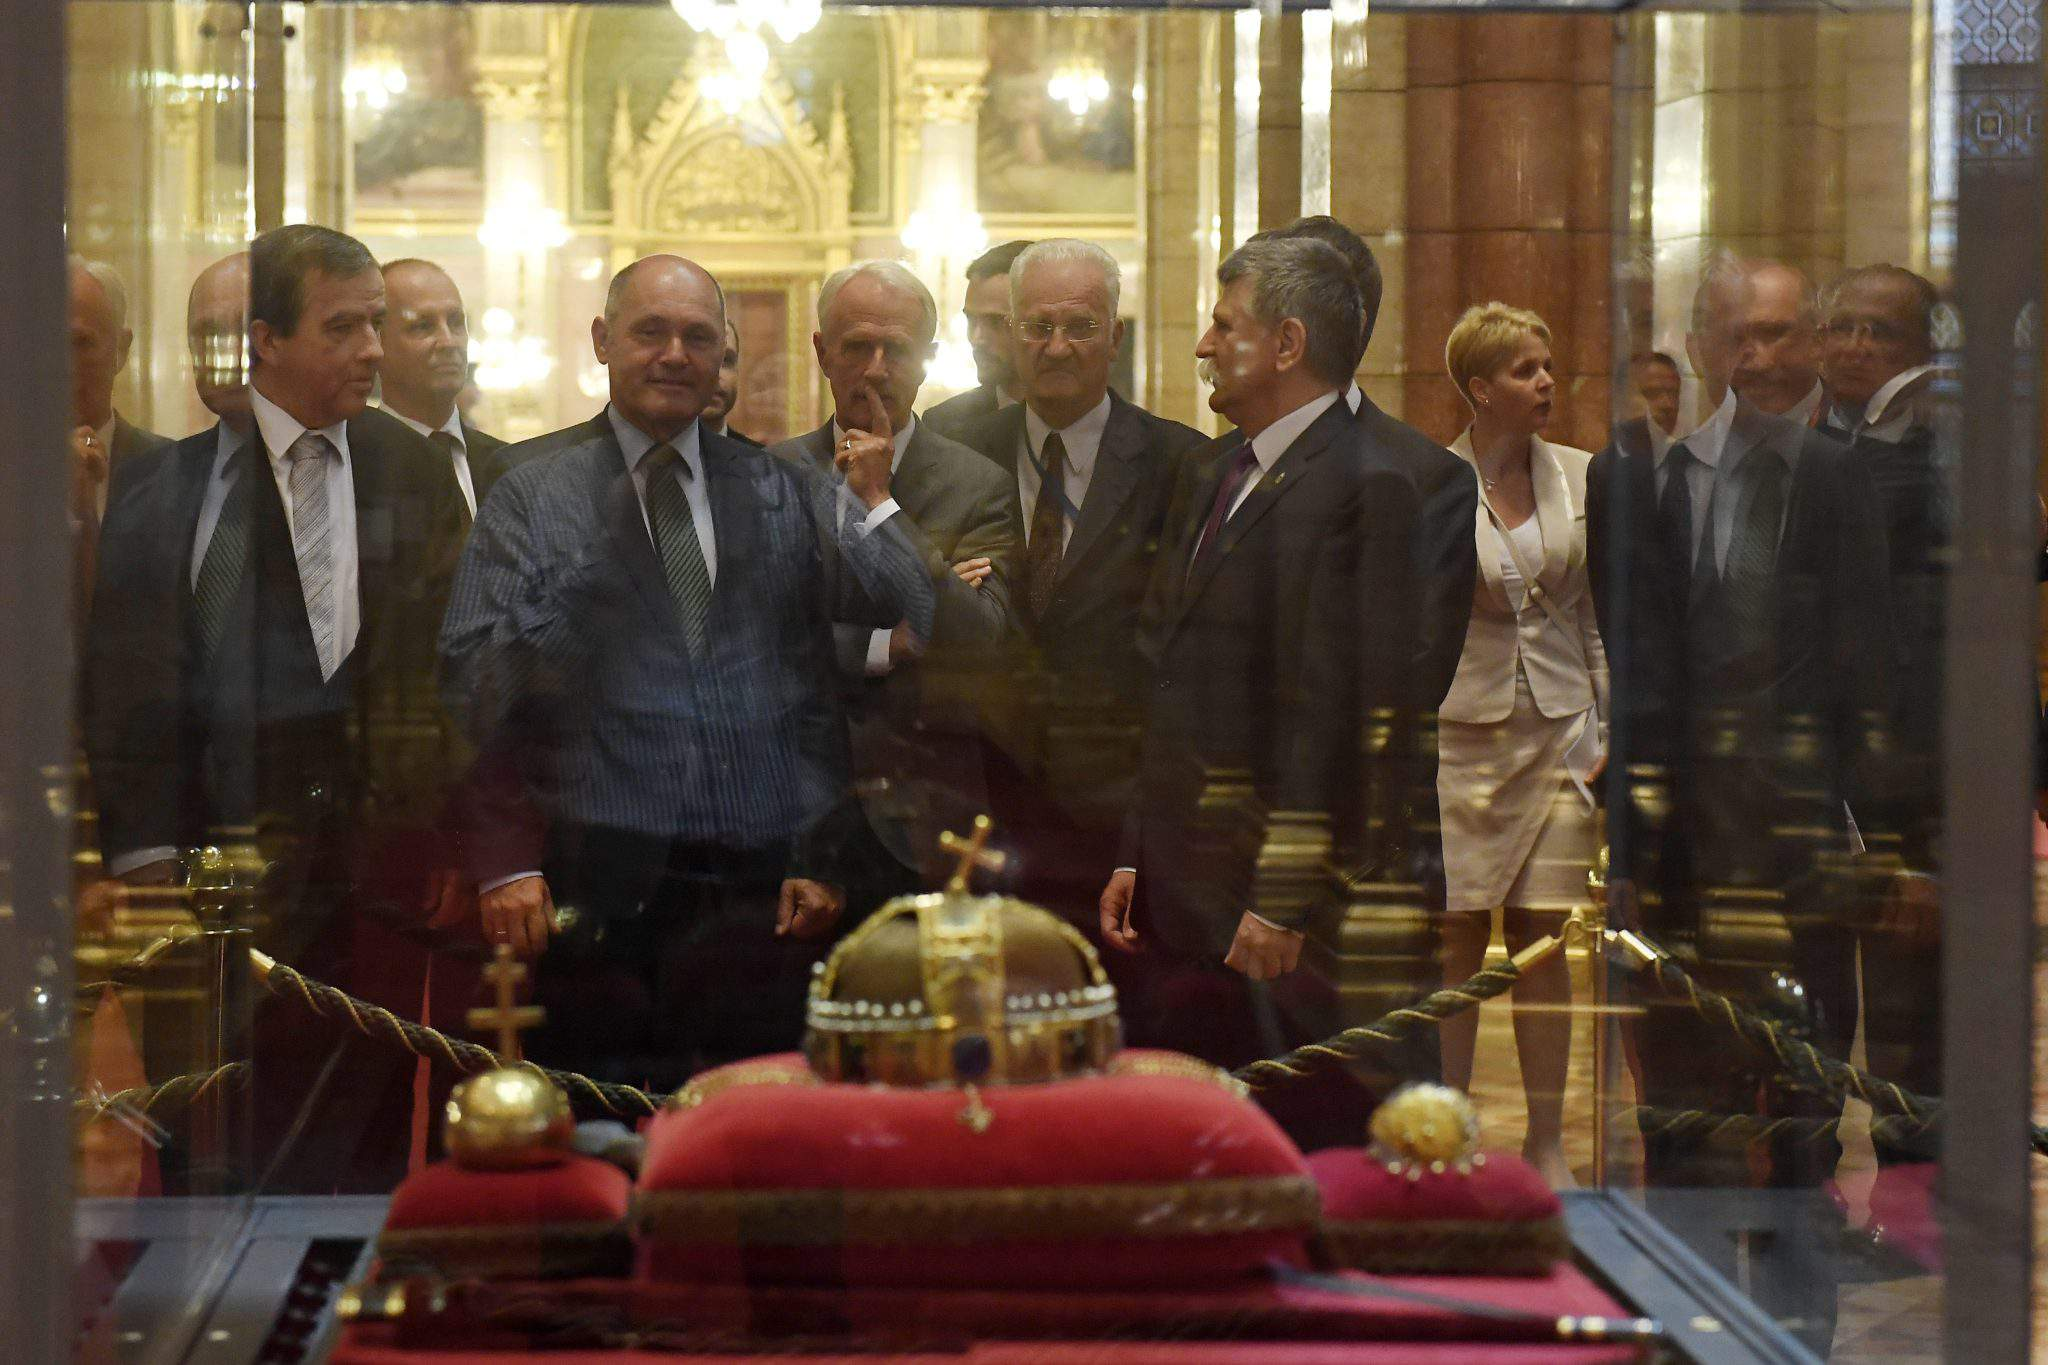 Sobotka Austria Hungarian Parliament